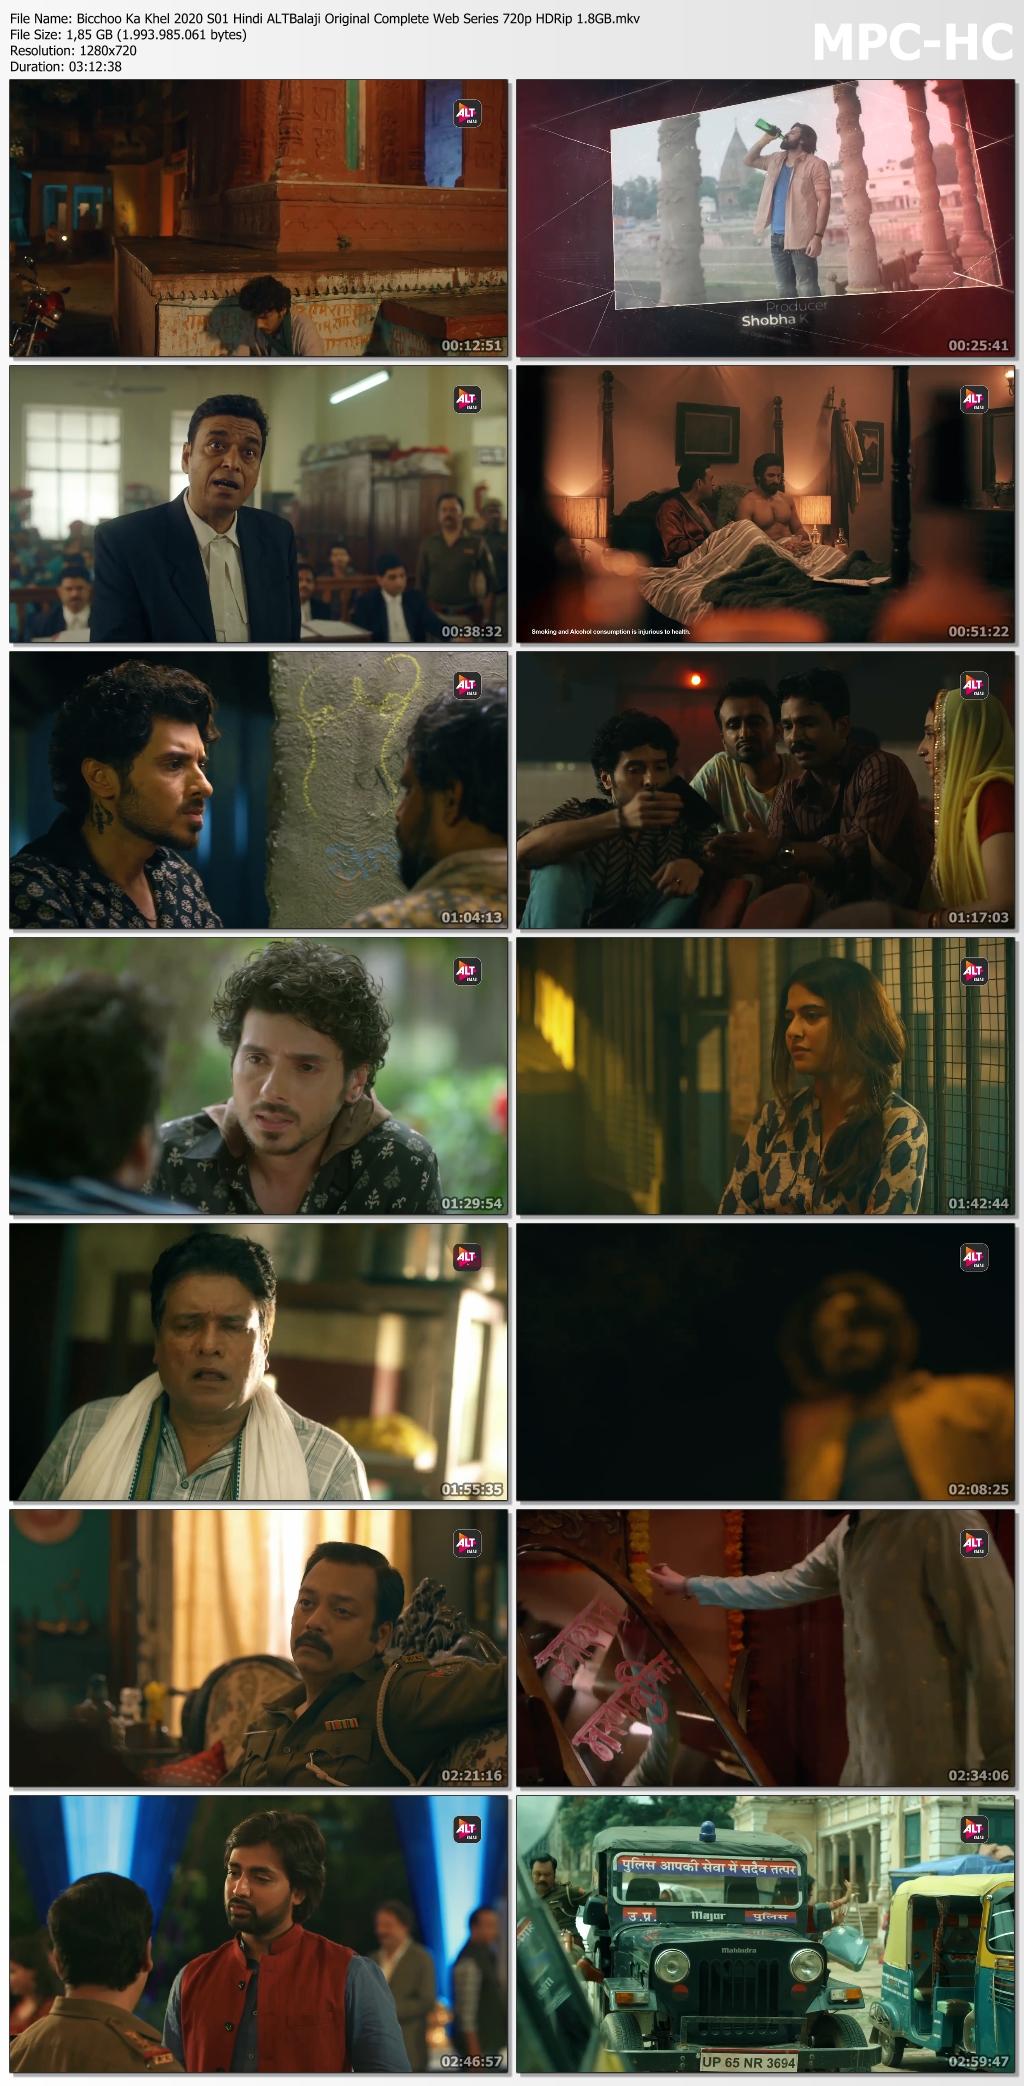 Bicchoo-Ka-Khel-2020-S01-Hindi-ALTBalaji-Original-Complete-Web-Series-720p-HDRip-1-8-GB-mkv-thumbs